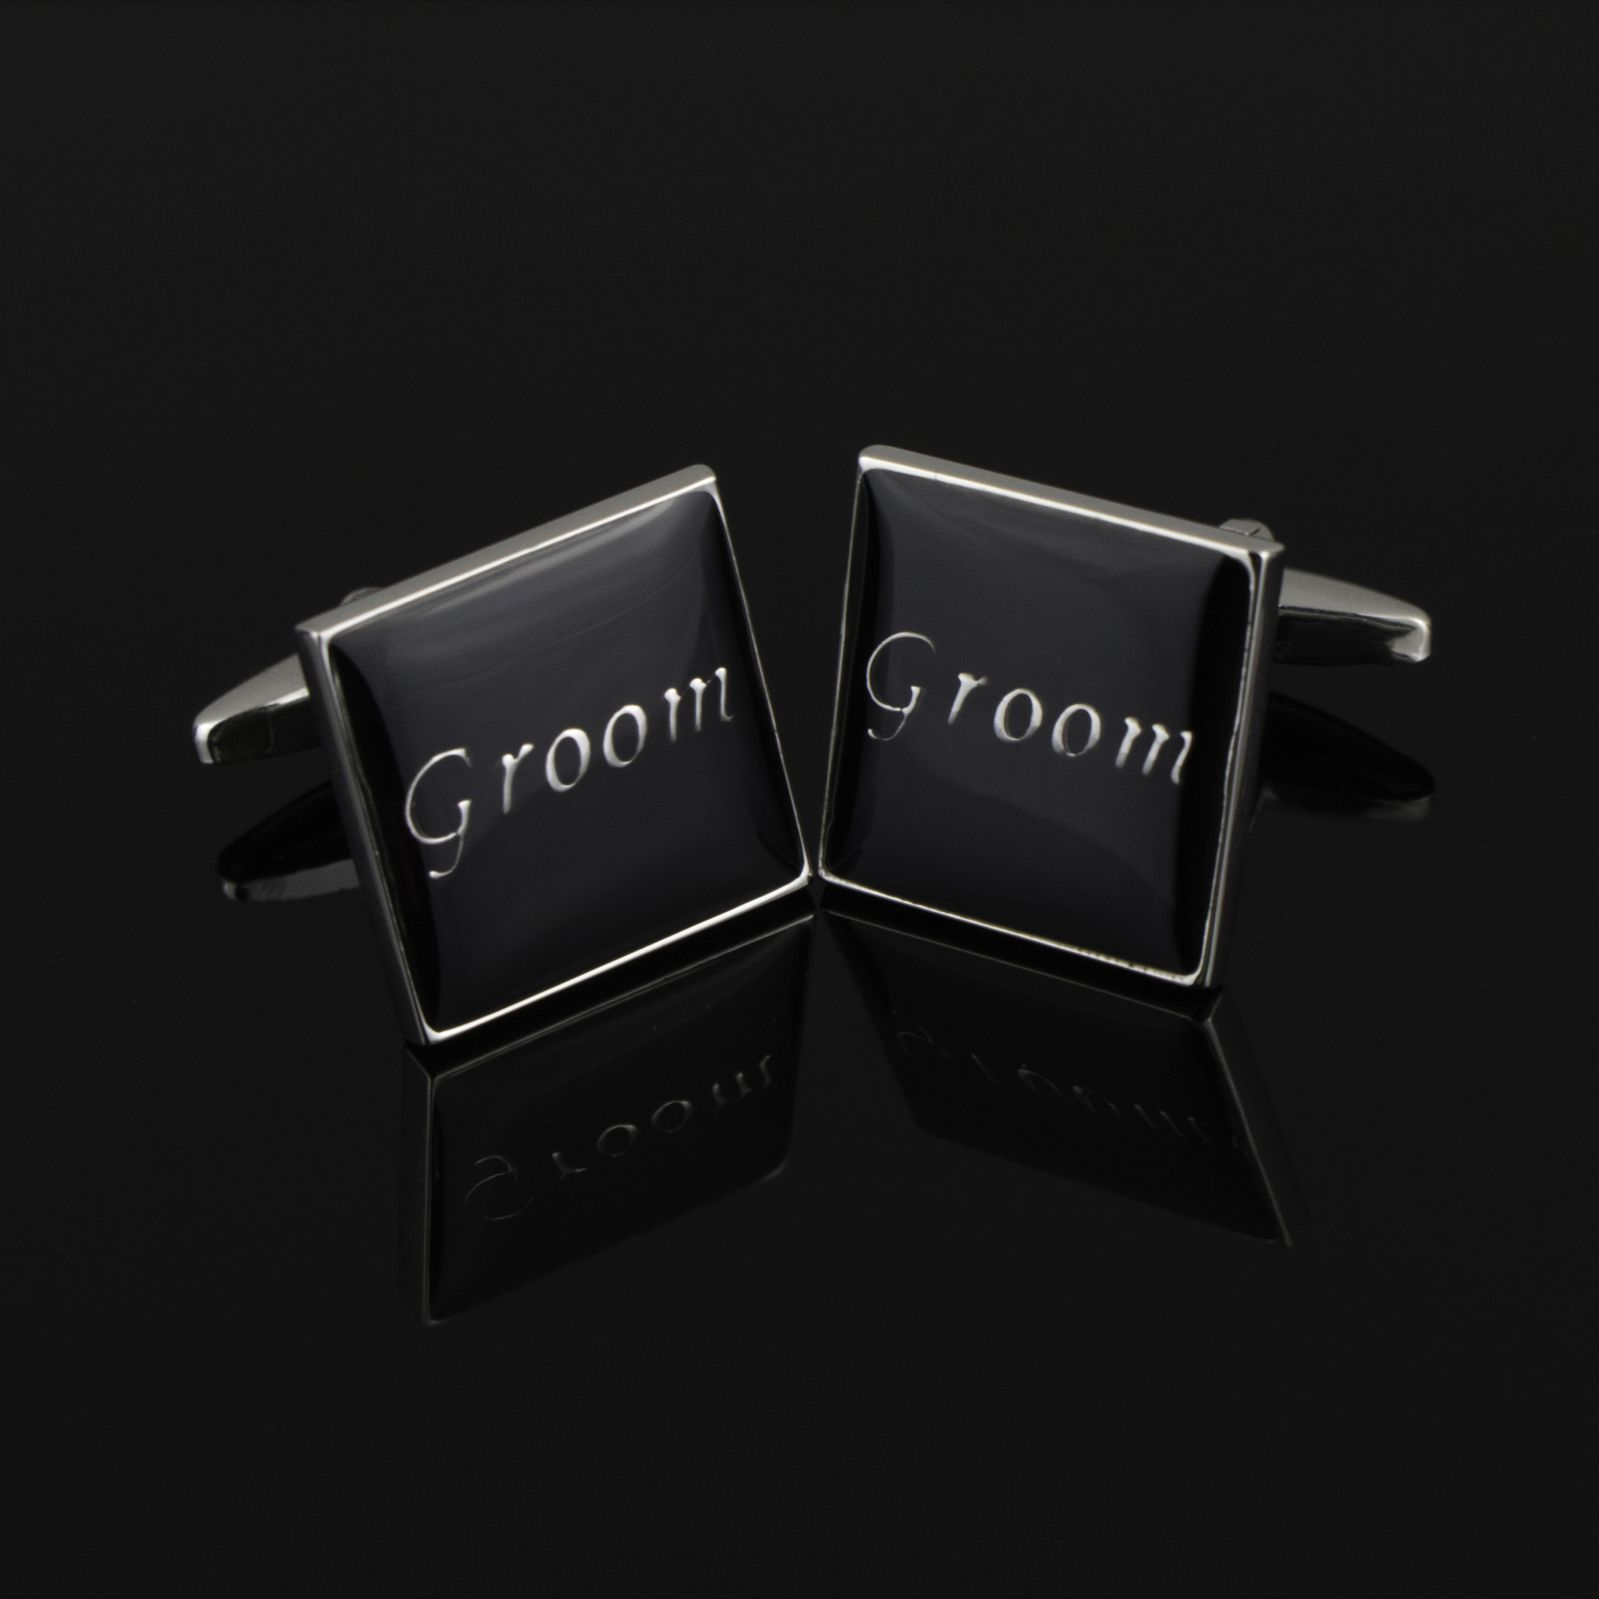 Groom Black Cufflinks